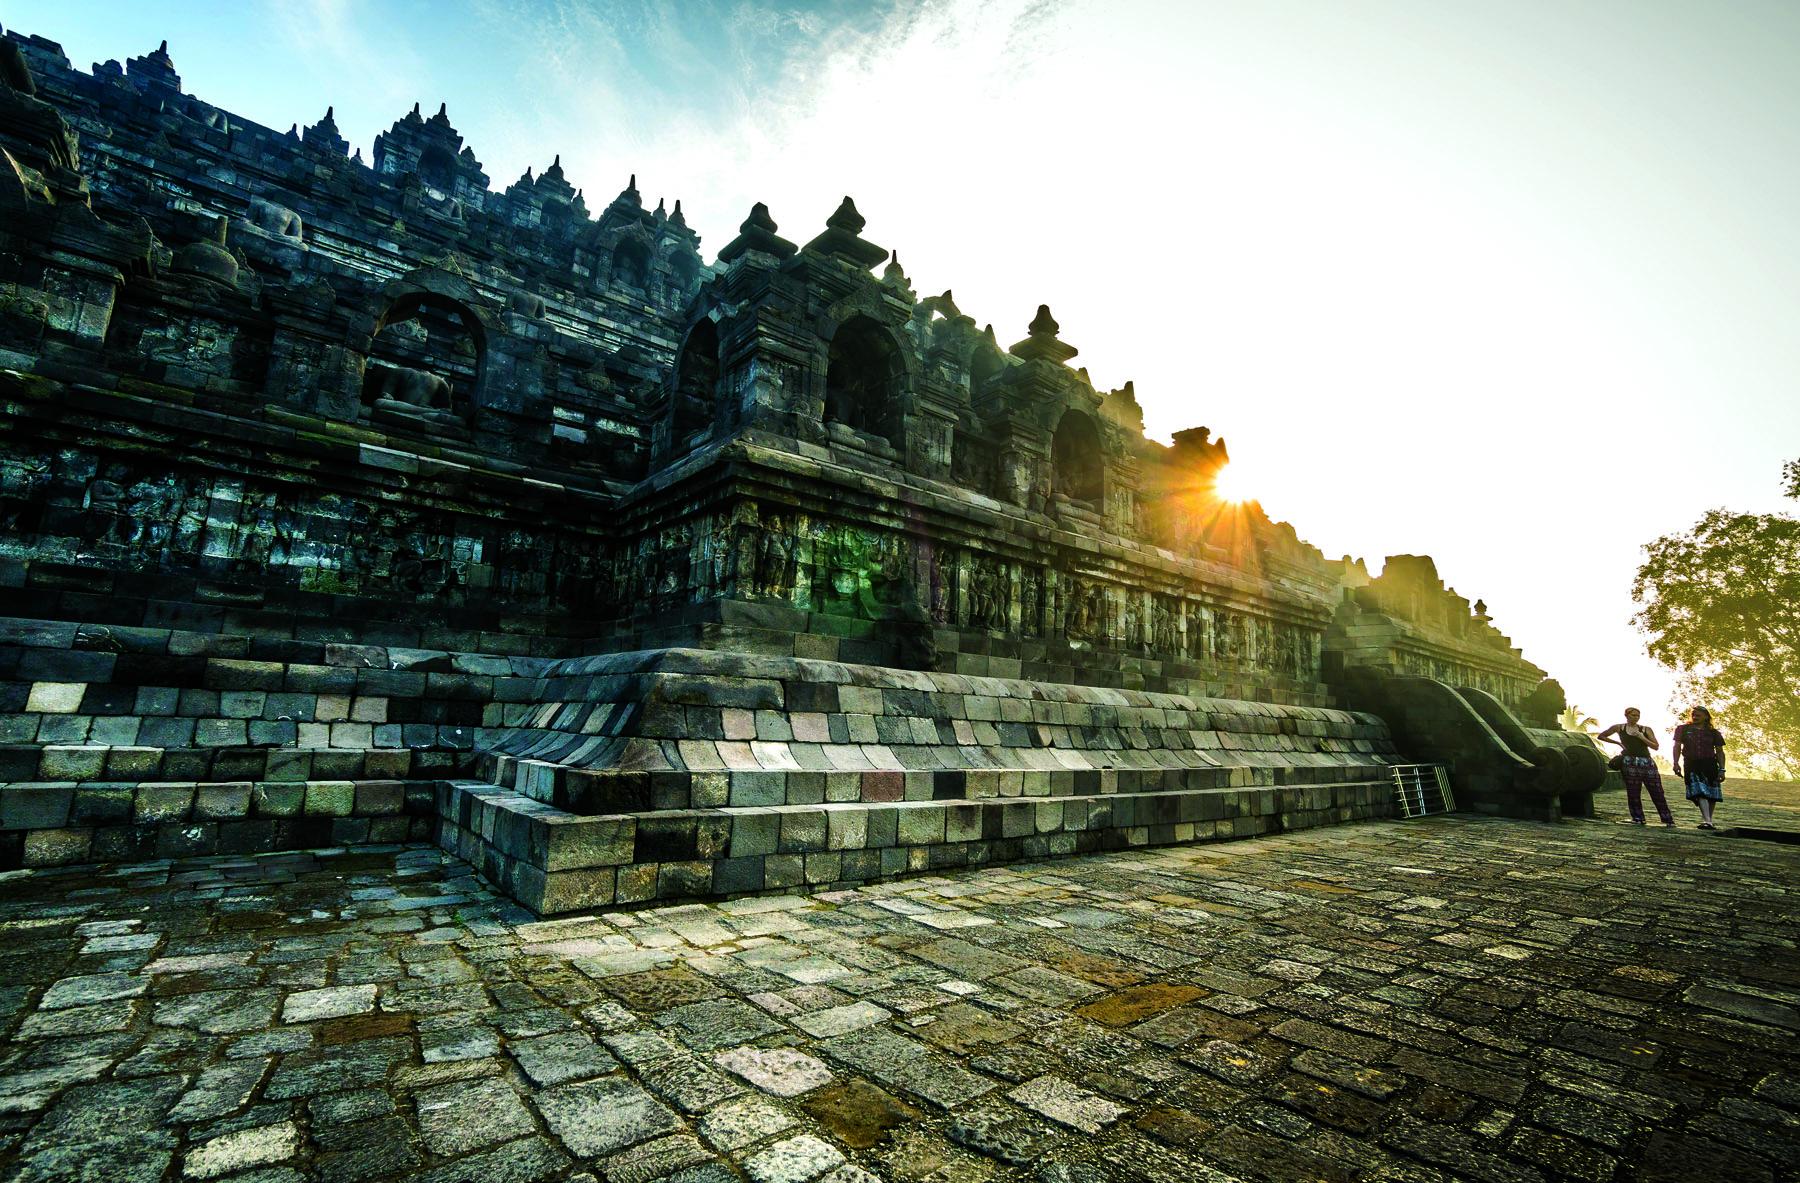 The single largest Buddhist structure on earth endures at Borobudur